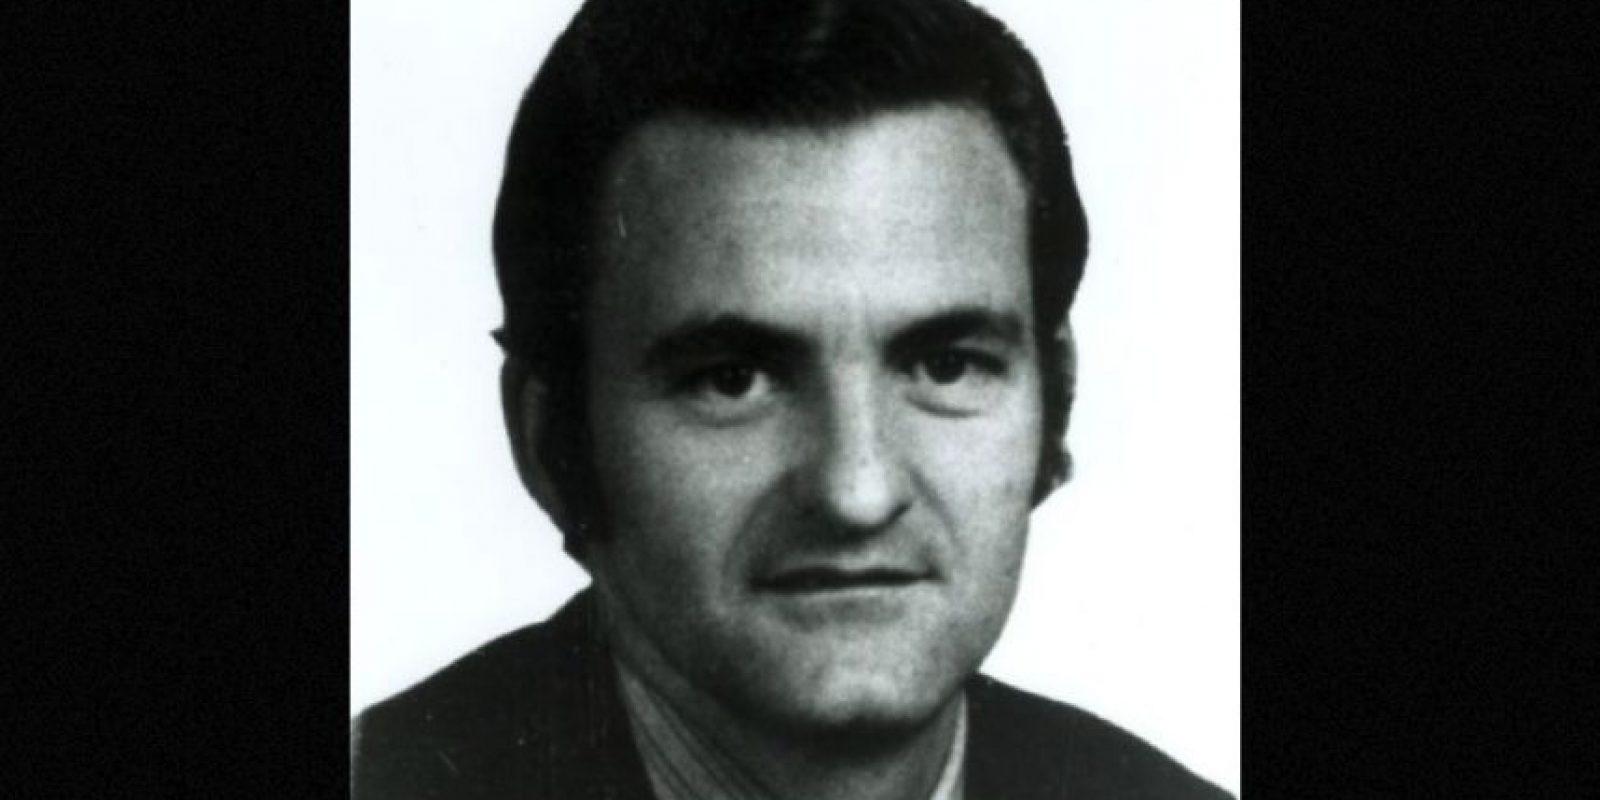 9. William Bradford Bishop, Jr. Foto:FBI.gov